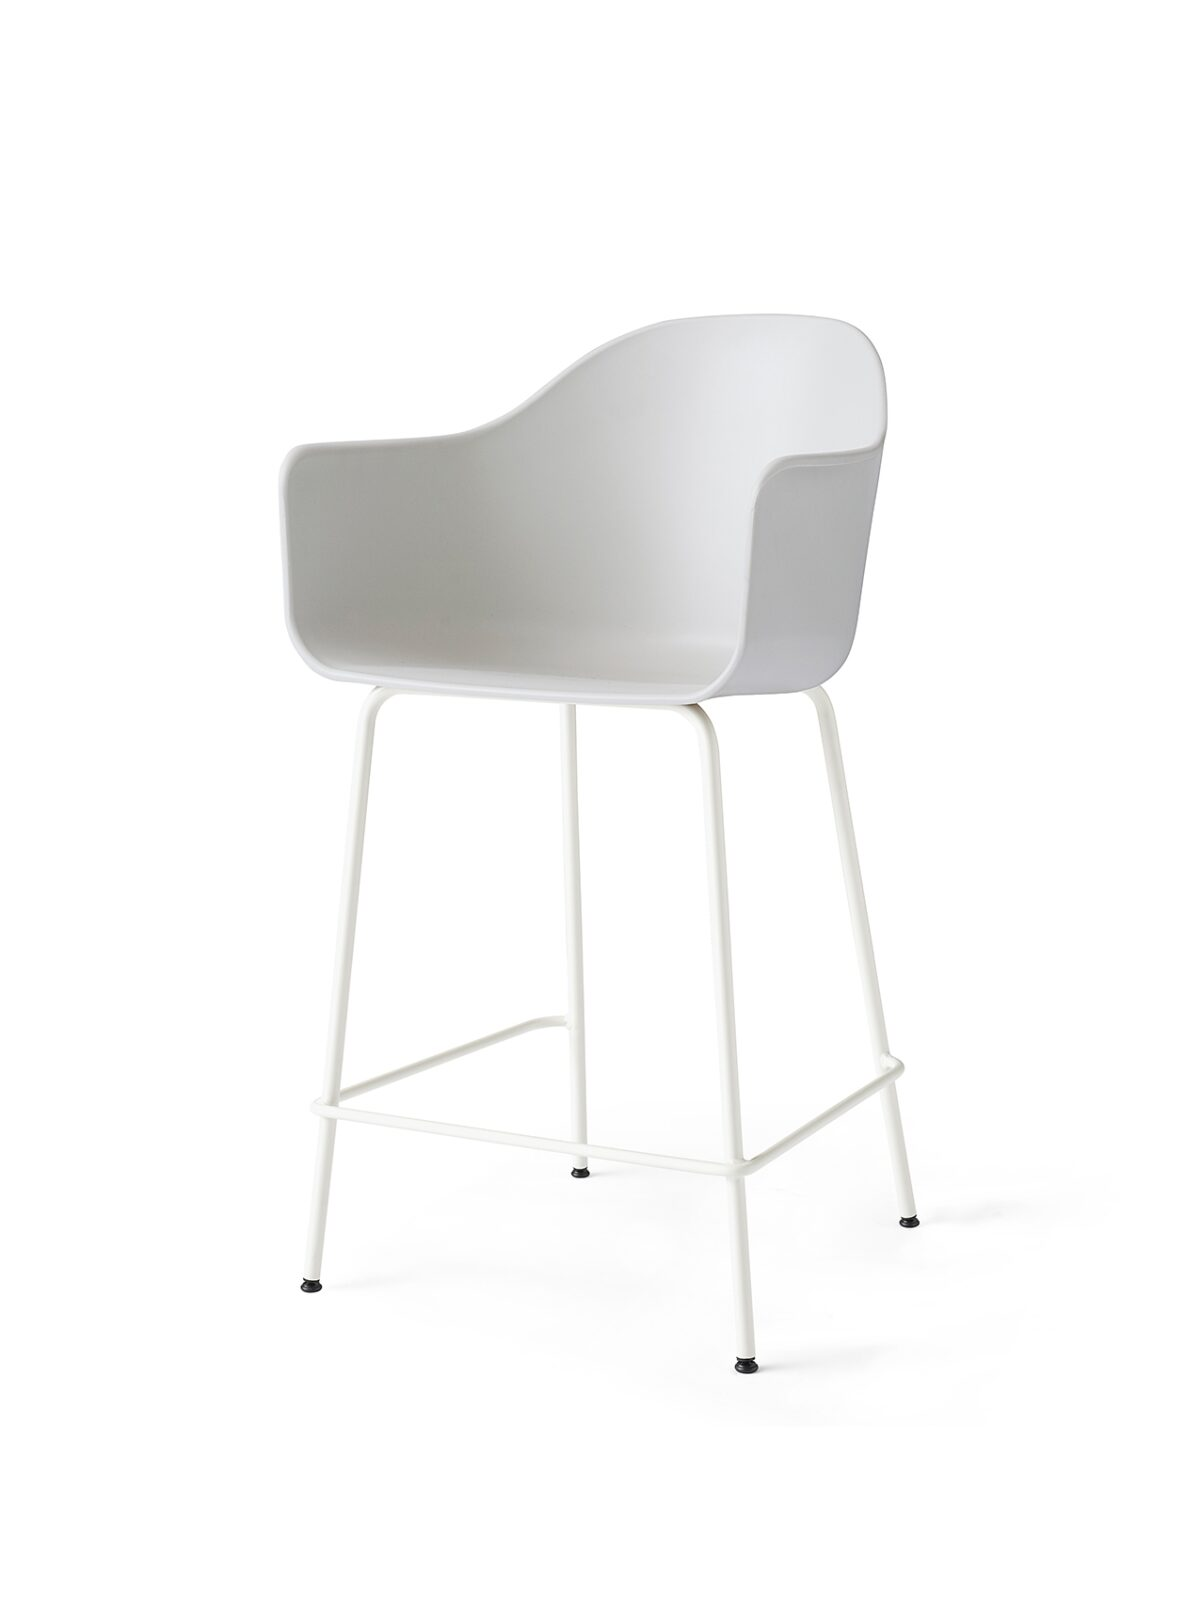 9361640 Harbour Chair Counter LightGrey LightGrey Angle